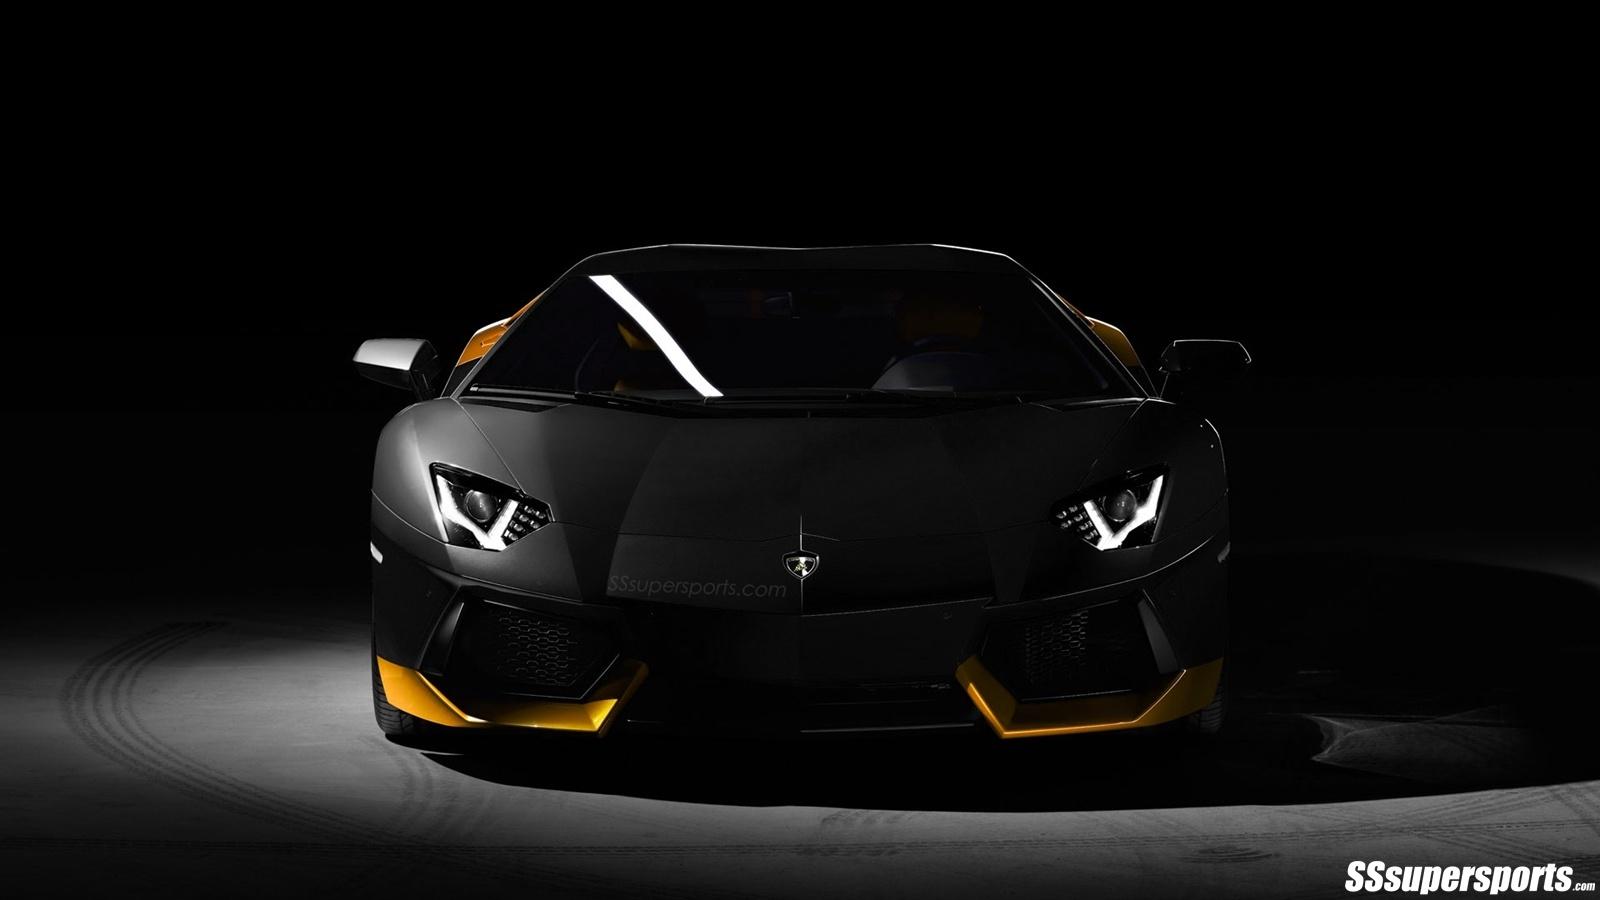 Black And Yellow Lamborghini Wallpaper 25 Widescreen